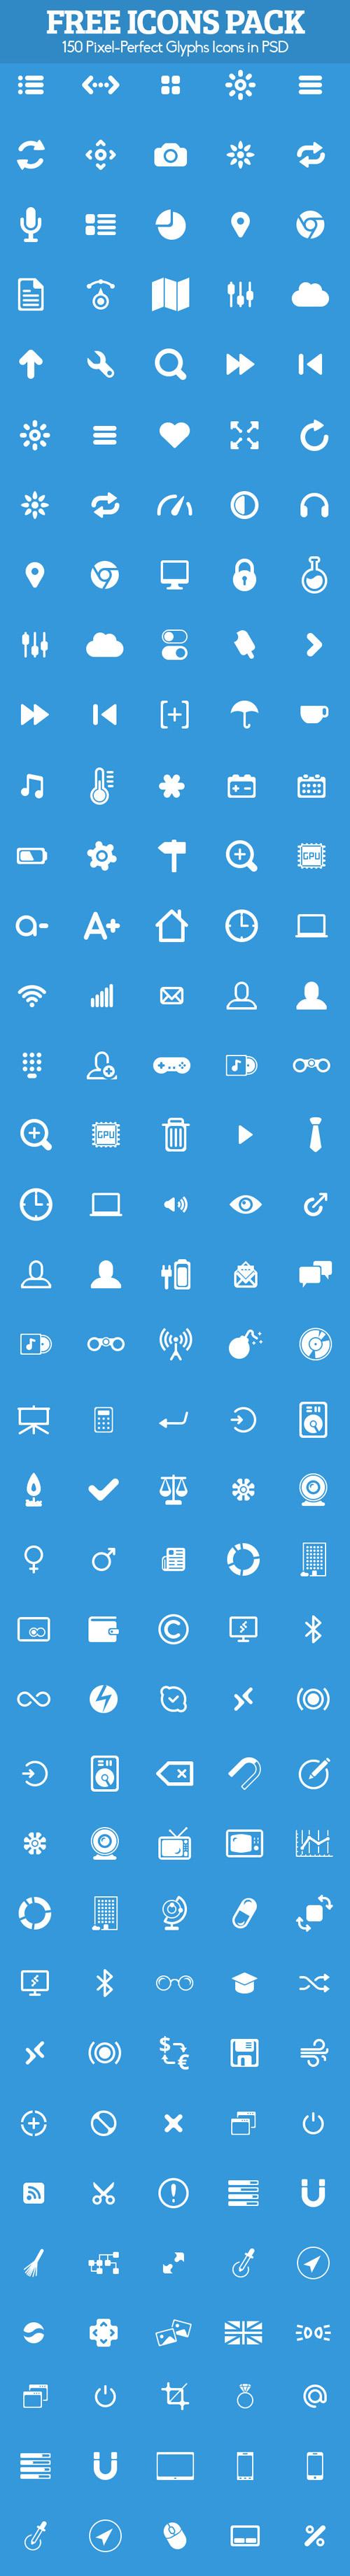 150 Free Glyphs Icons